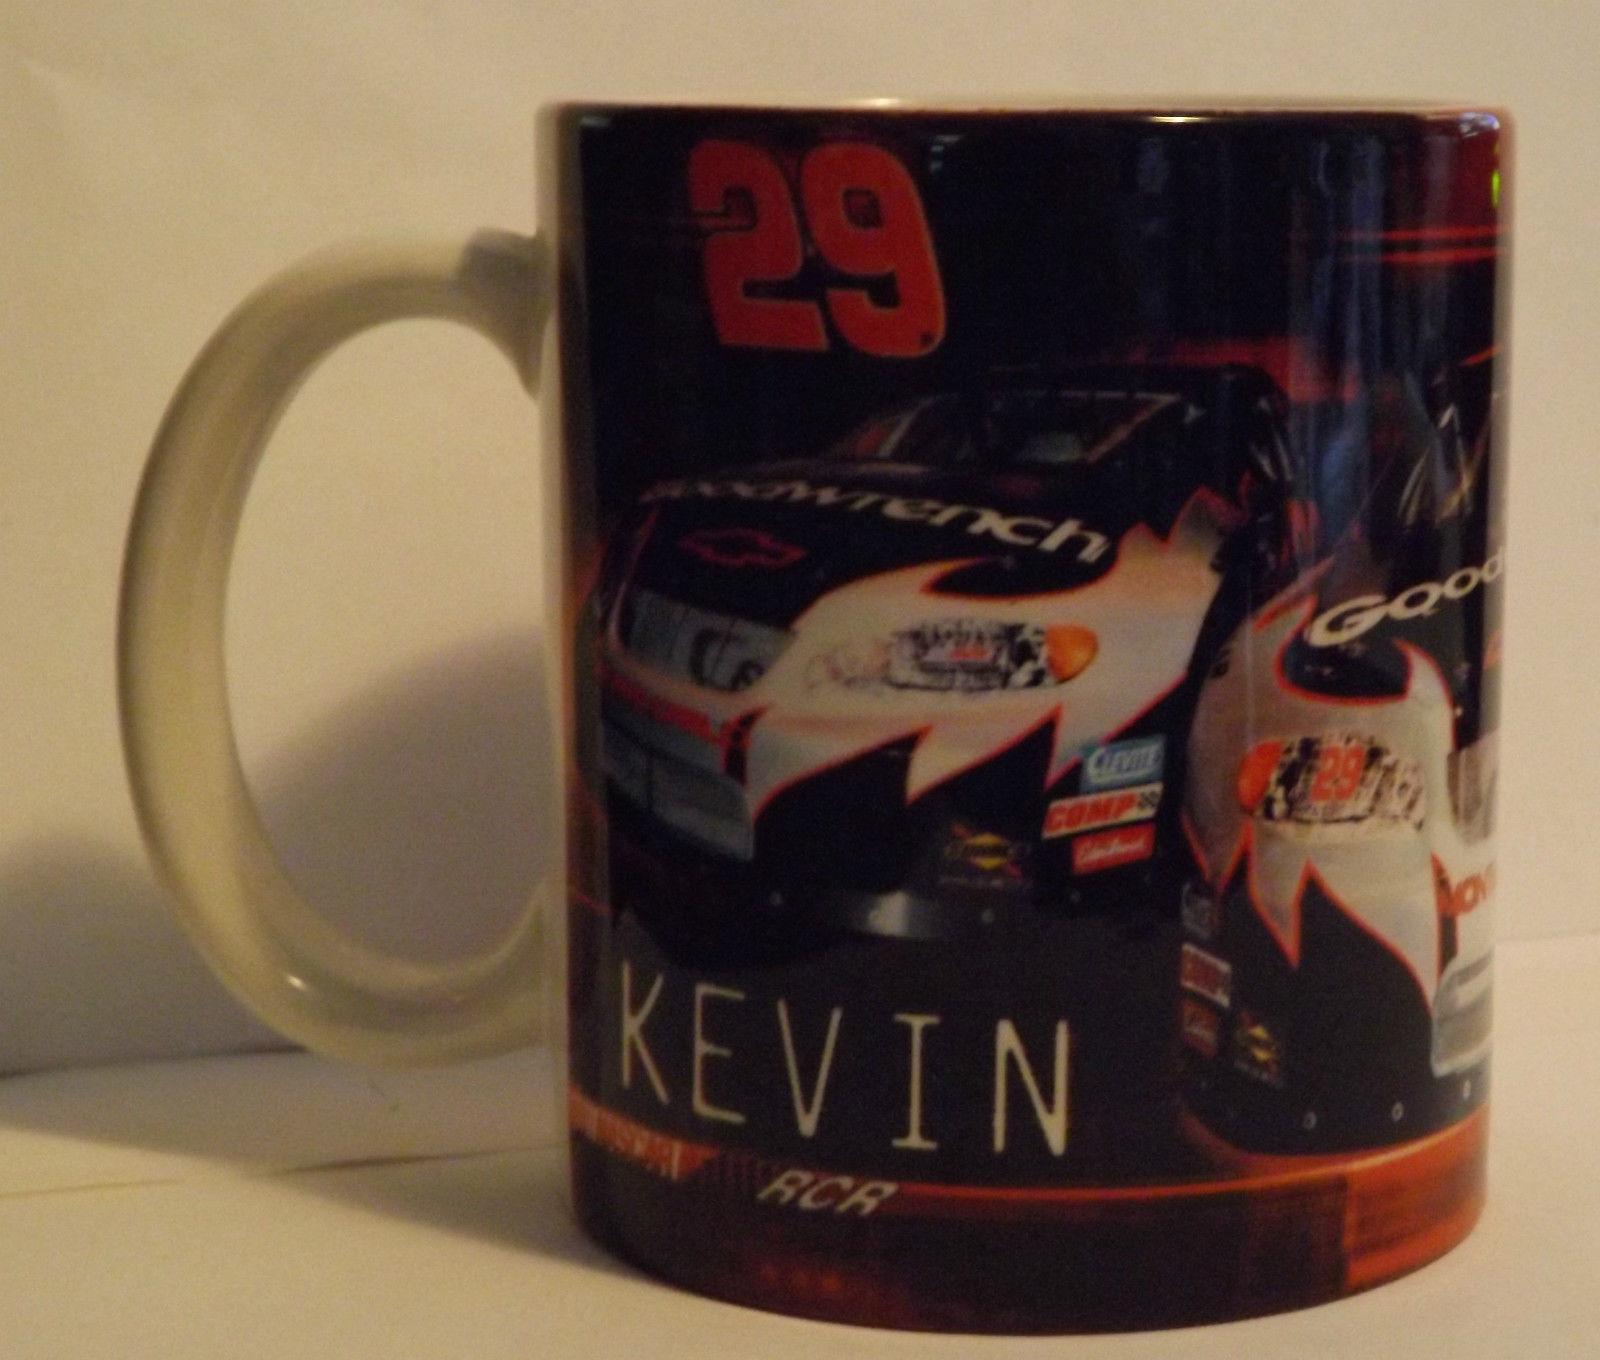 Kevin Harvick #29 NASCAR Mug